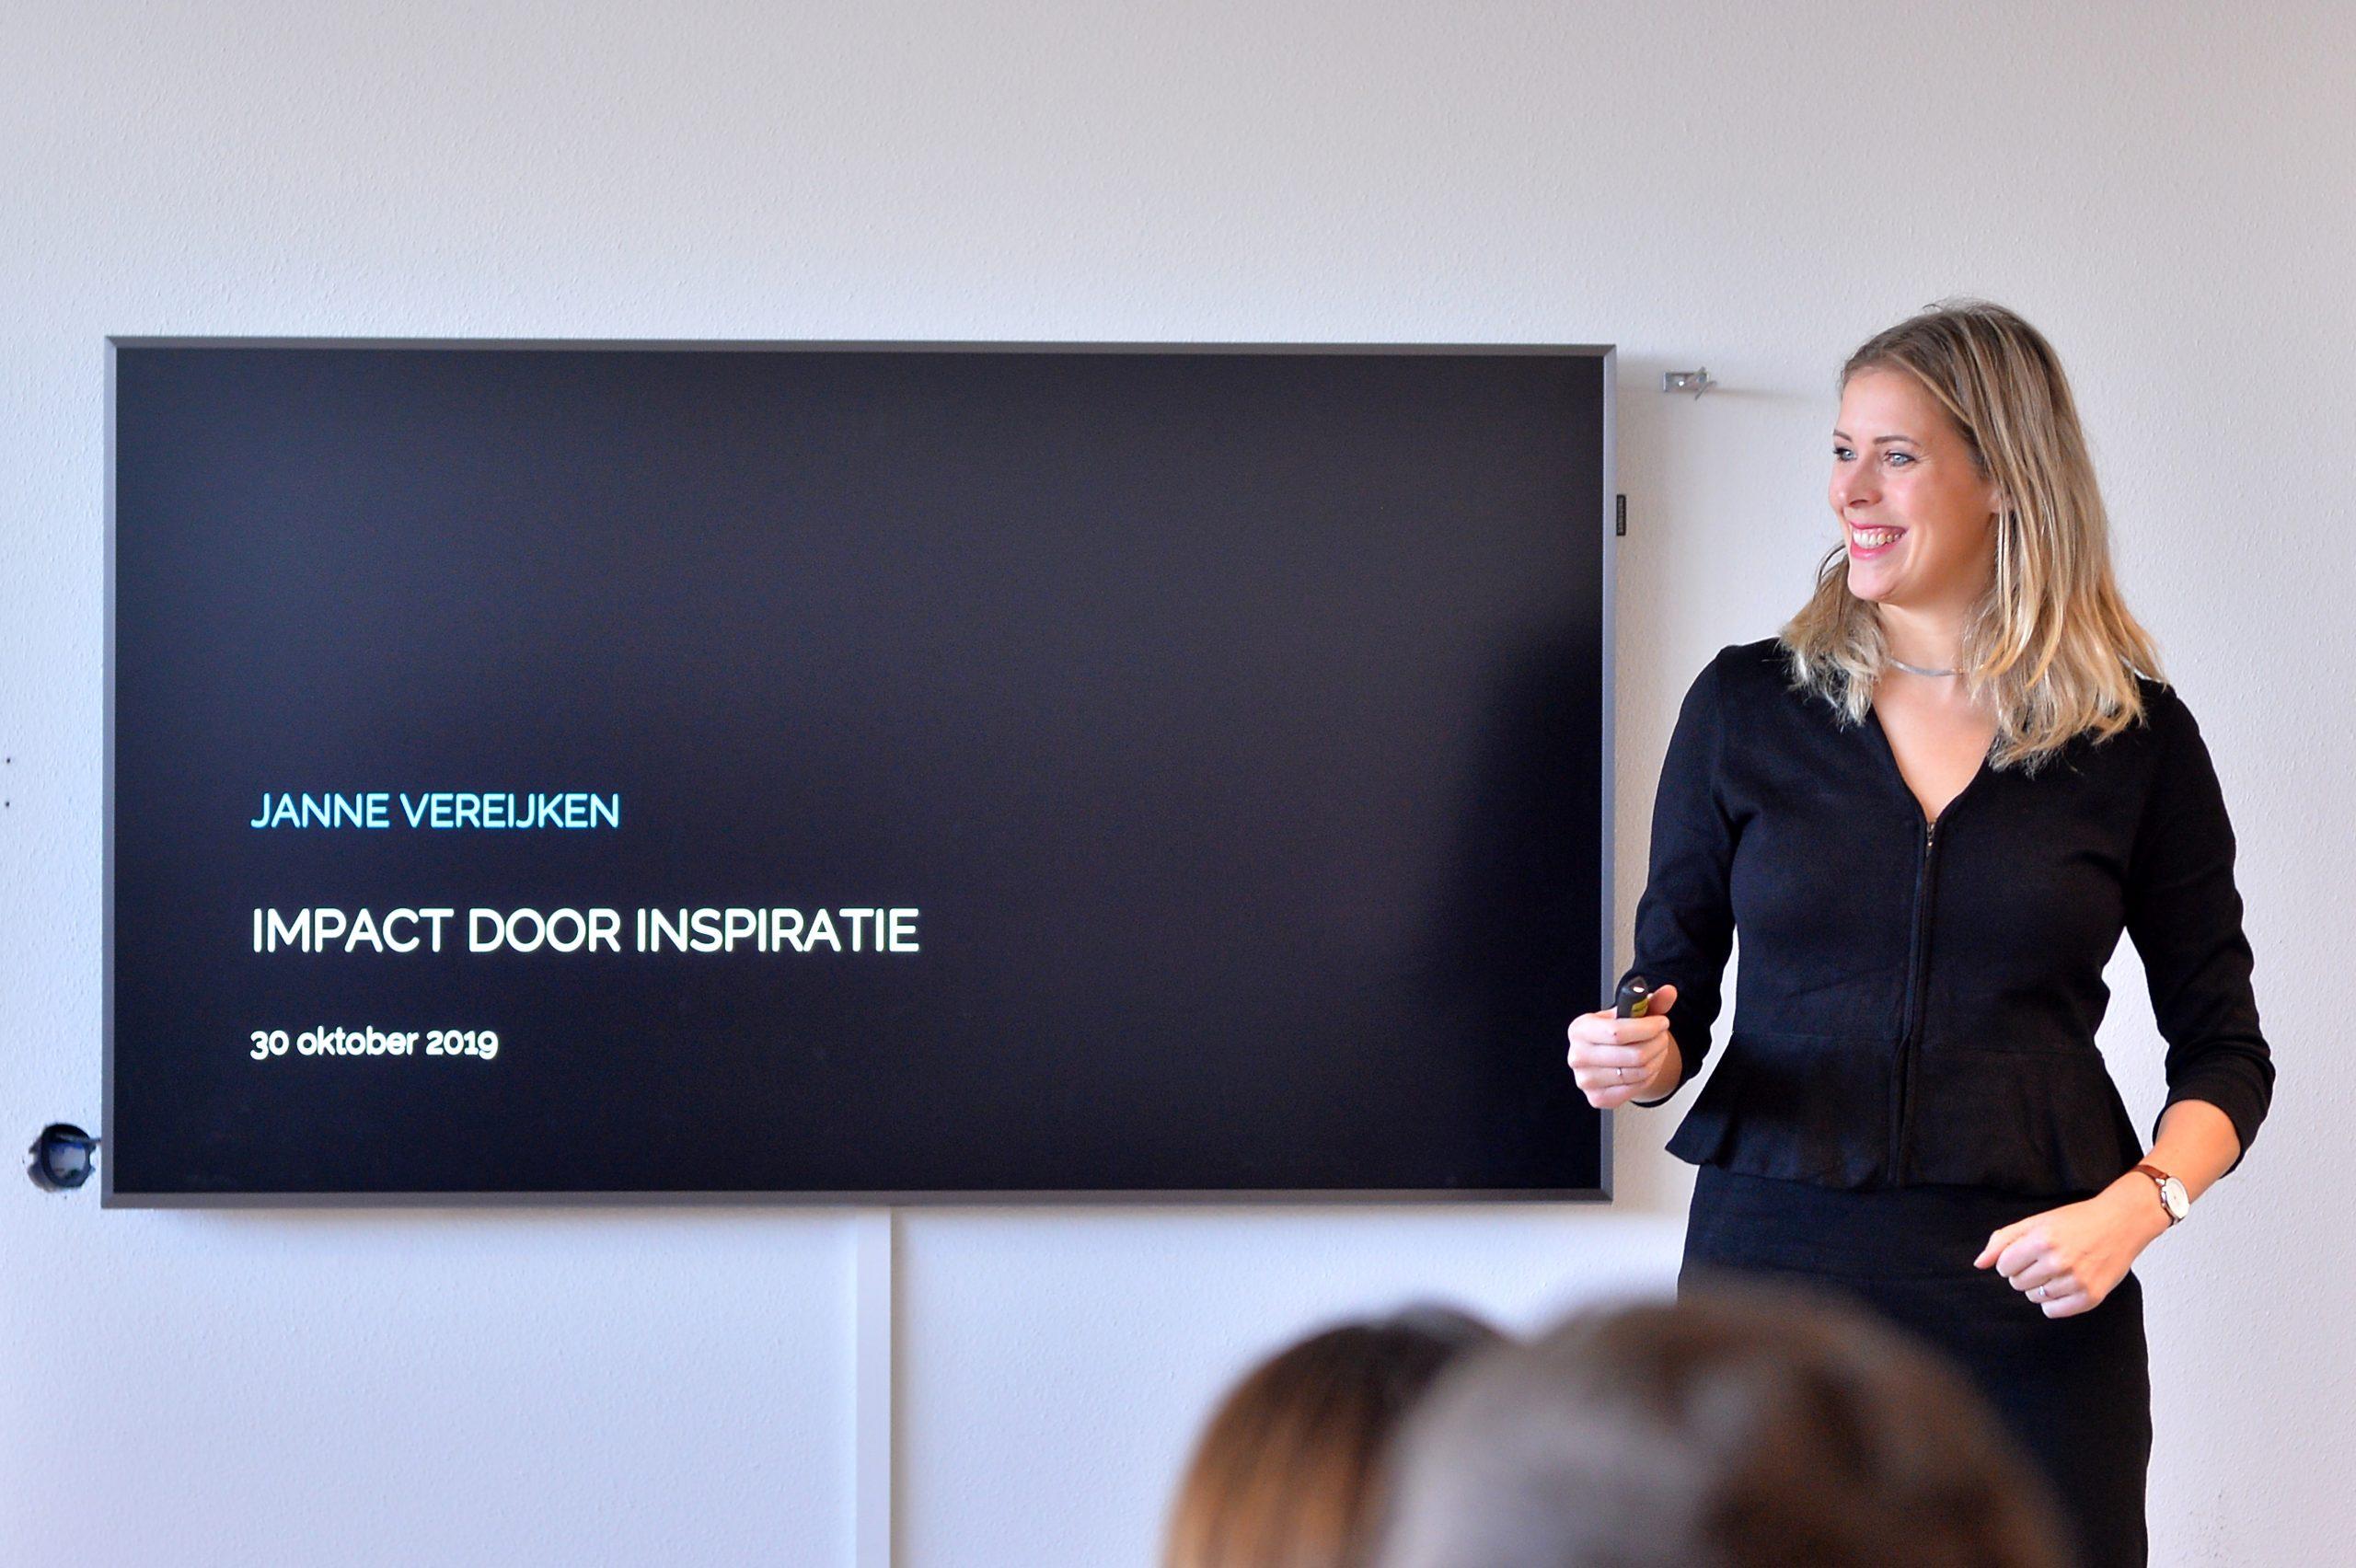 BTG KPN innovatie digitale transformatie 5G Janne Vereijken